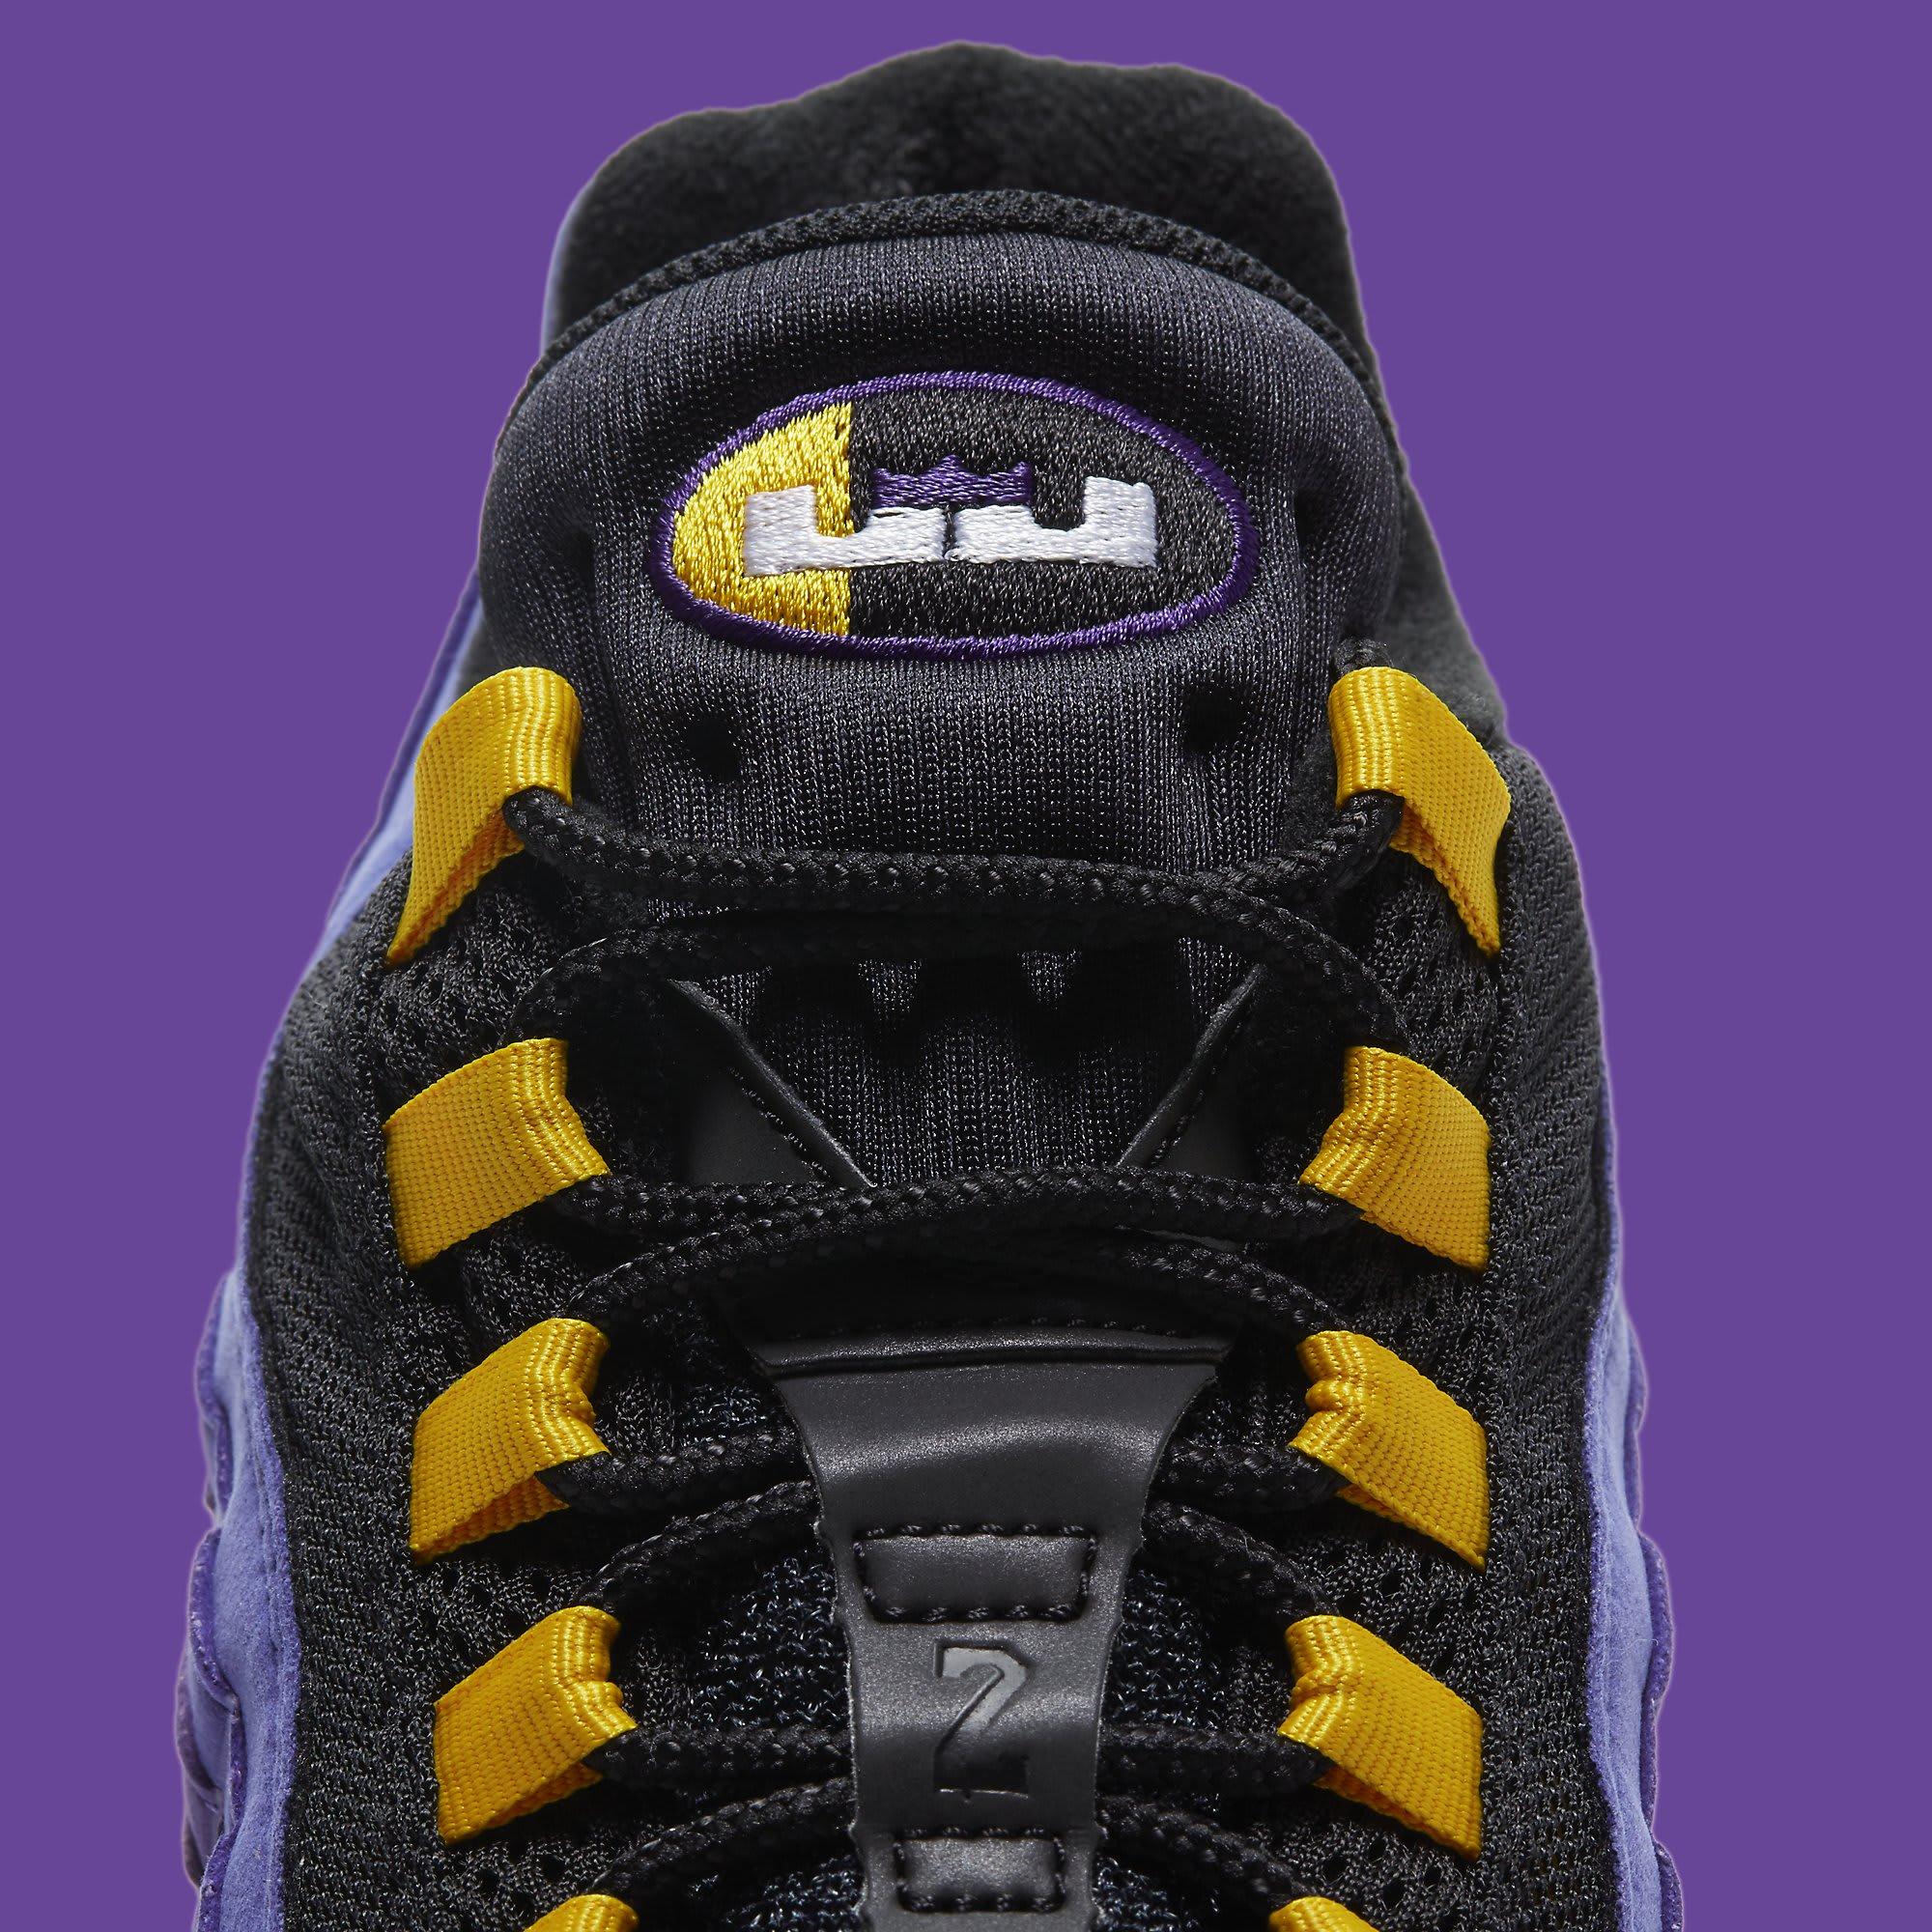 Nike Air Max 95 'LeBron' CZ3624-001 Tongue